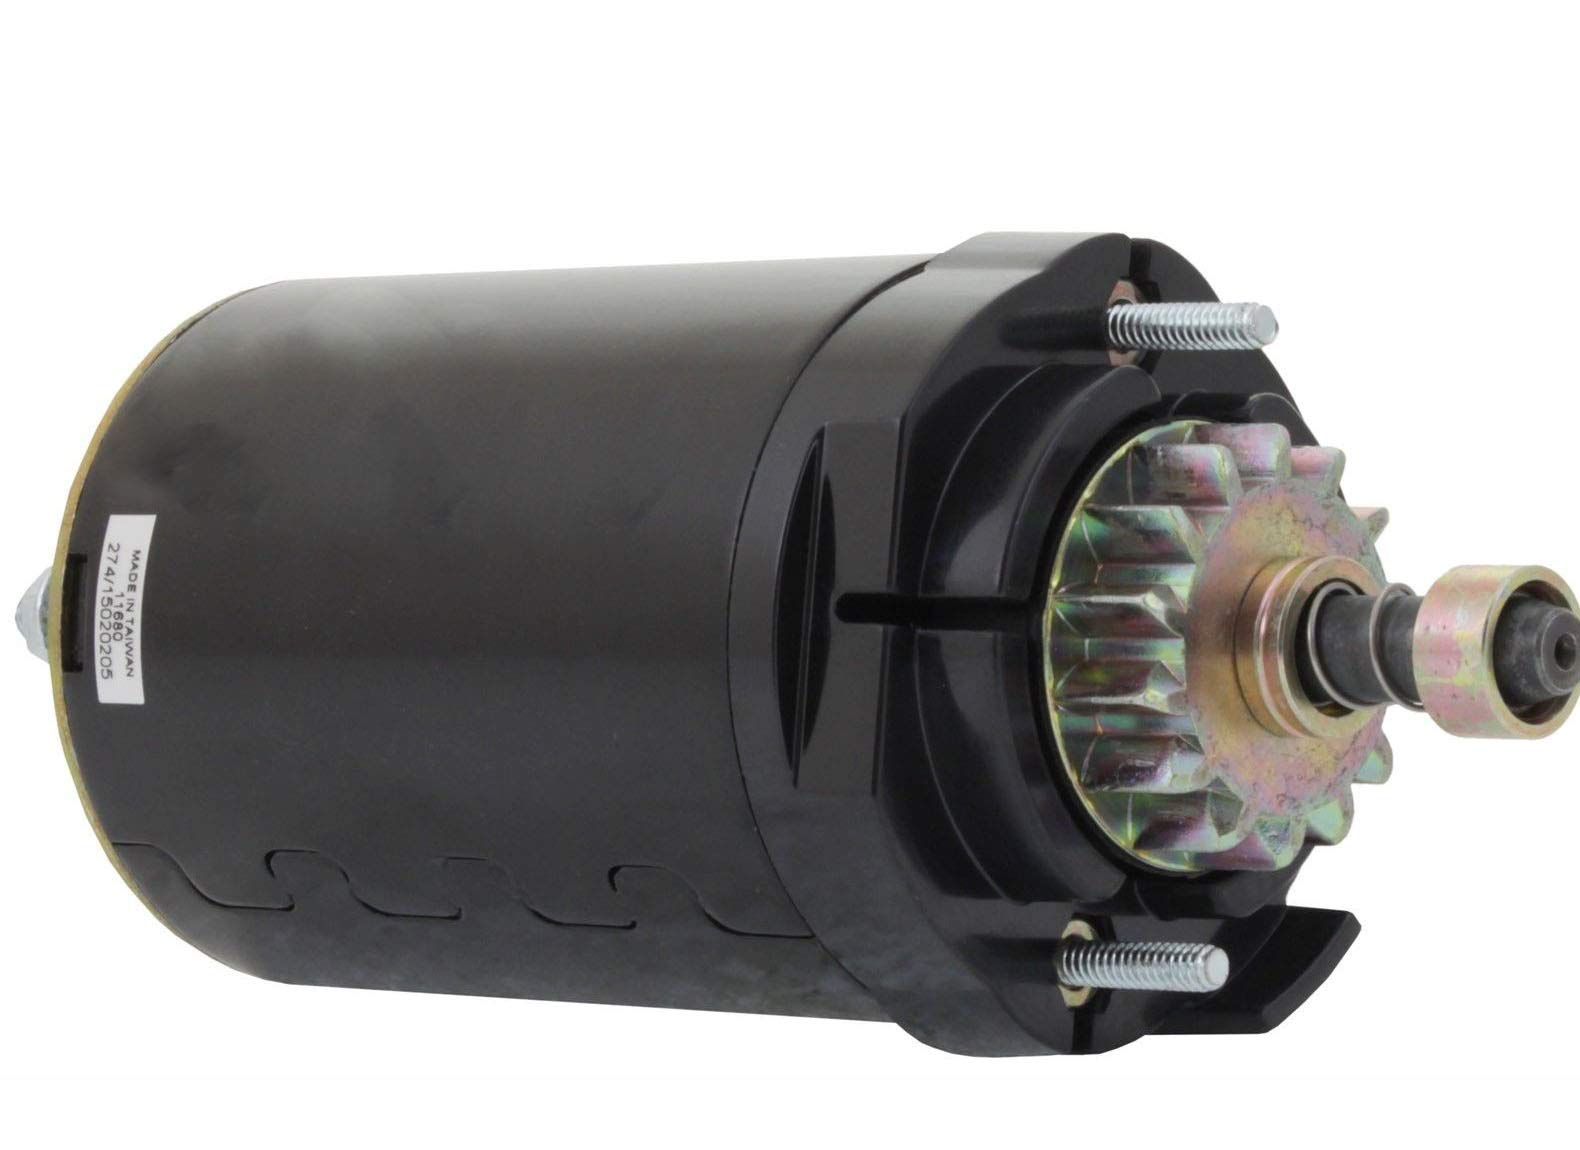 BMotorParts Motor Starter for Ariens 93603800/A19K4Z 960460002 00 Tractor w/Kohler